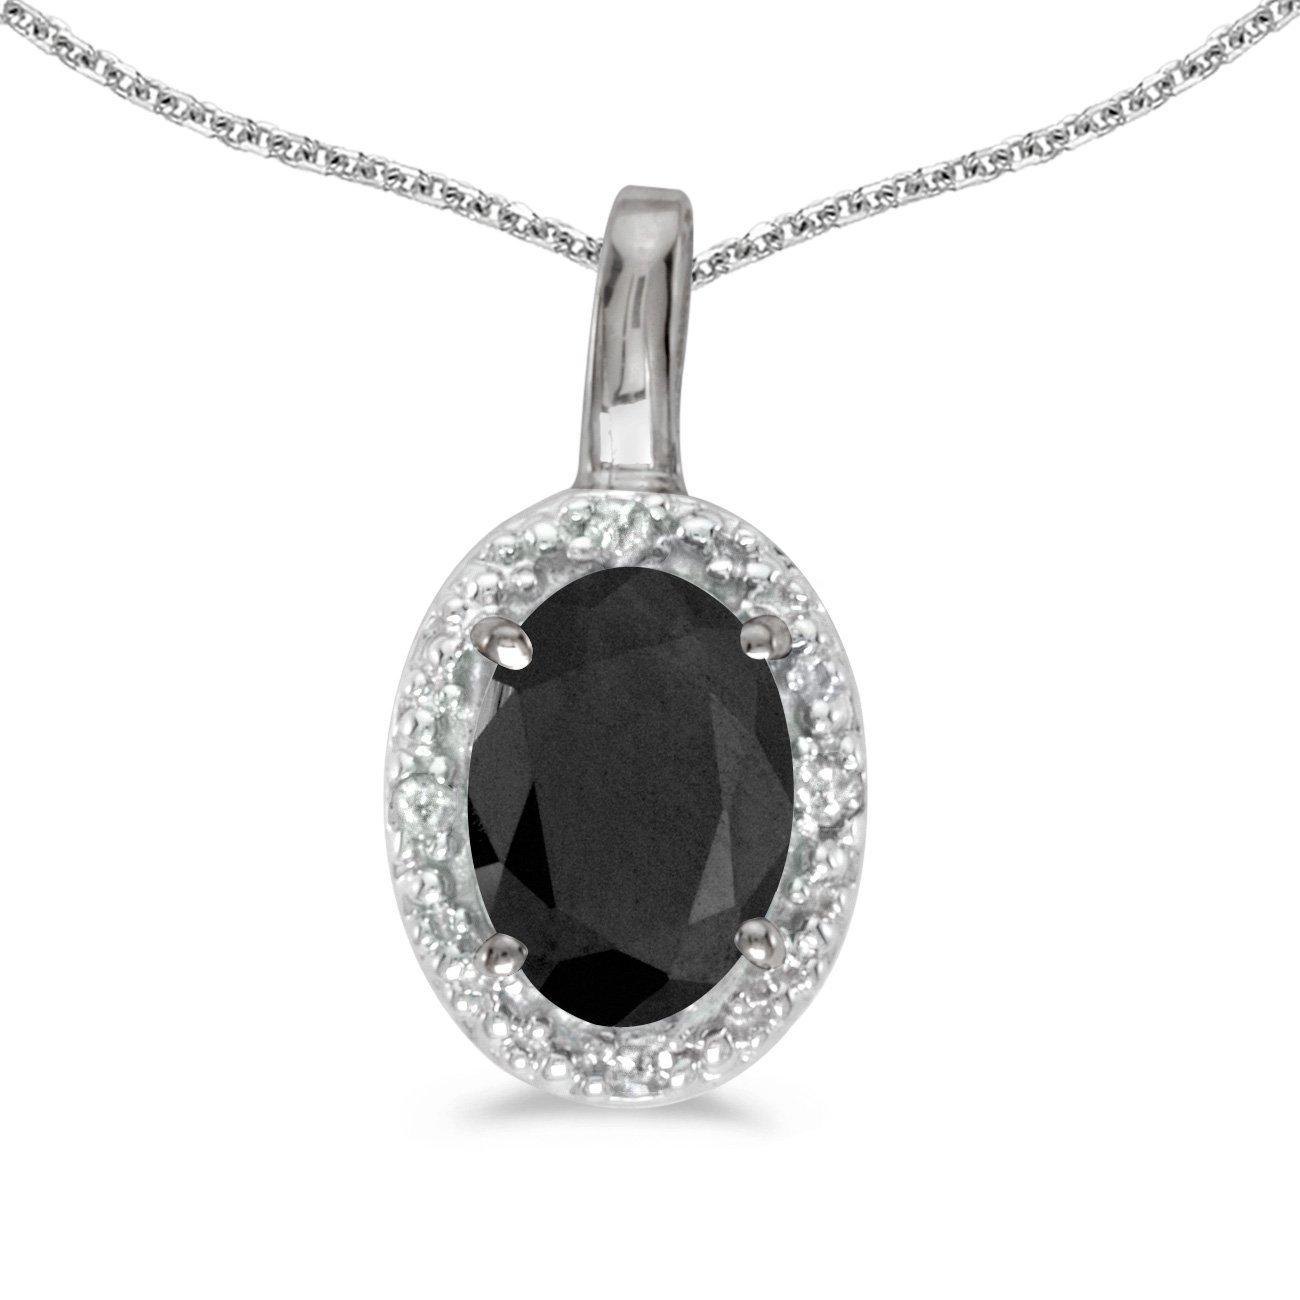 1//3 Cttw. FB Jewels Solid 10k White Gold Genuine Birthstone Oval Gemstone And Diamond Pendant